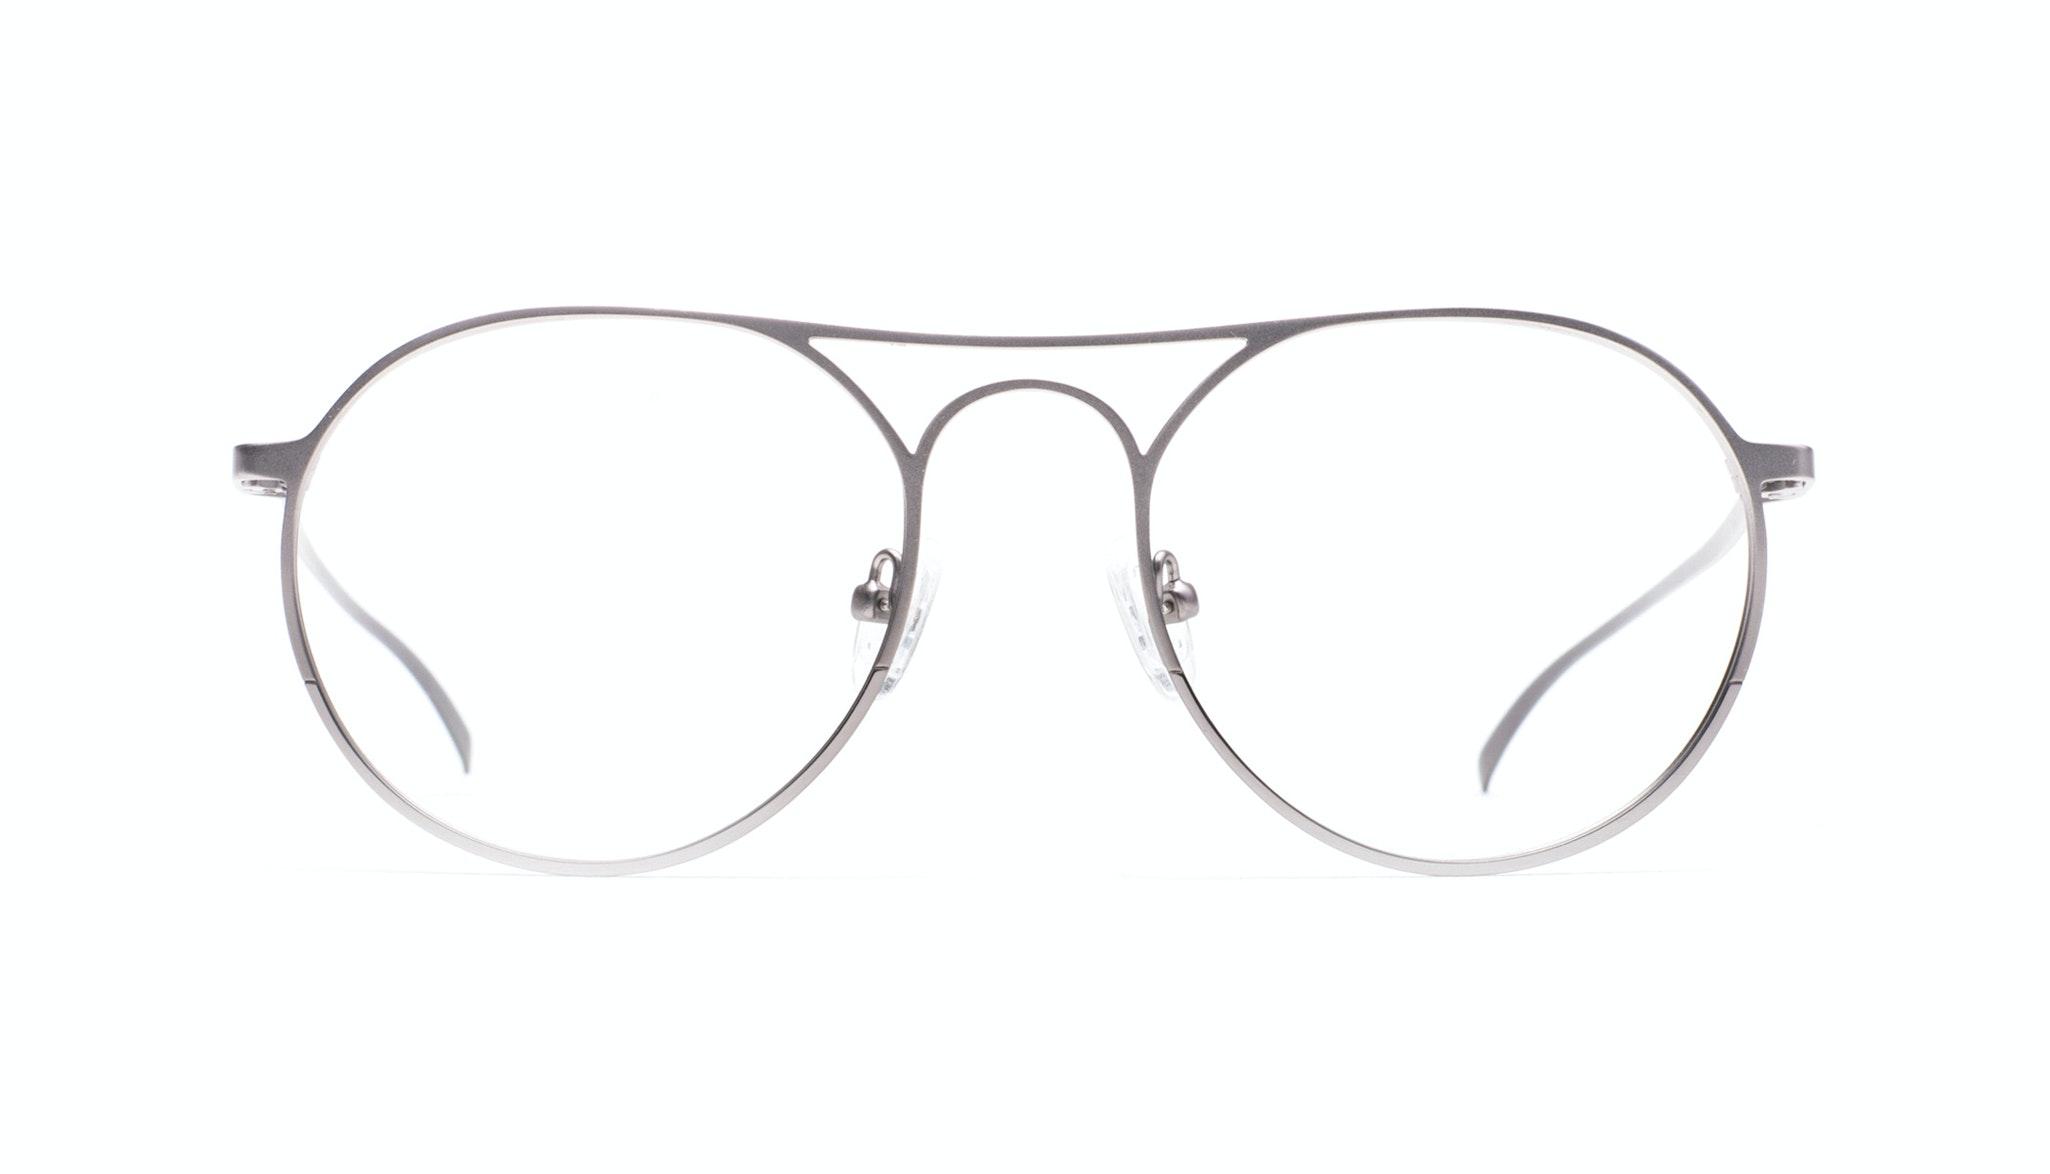 Affordable Fashion Glasses Aviator Round Eyeglasses Men Contour Silver Front